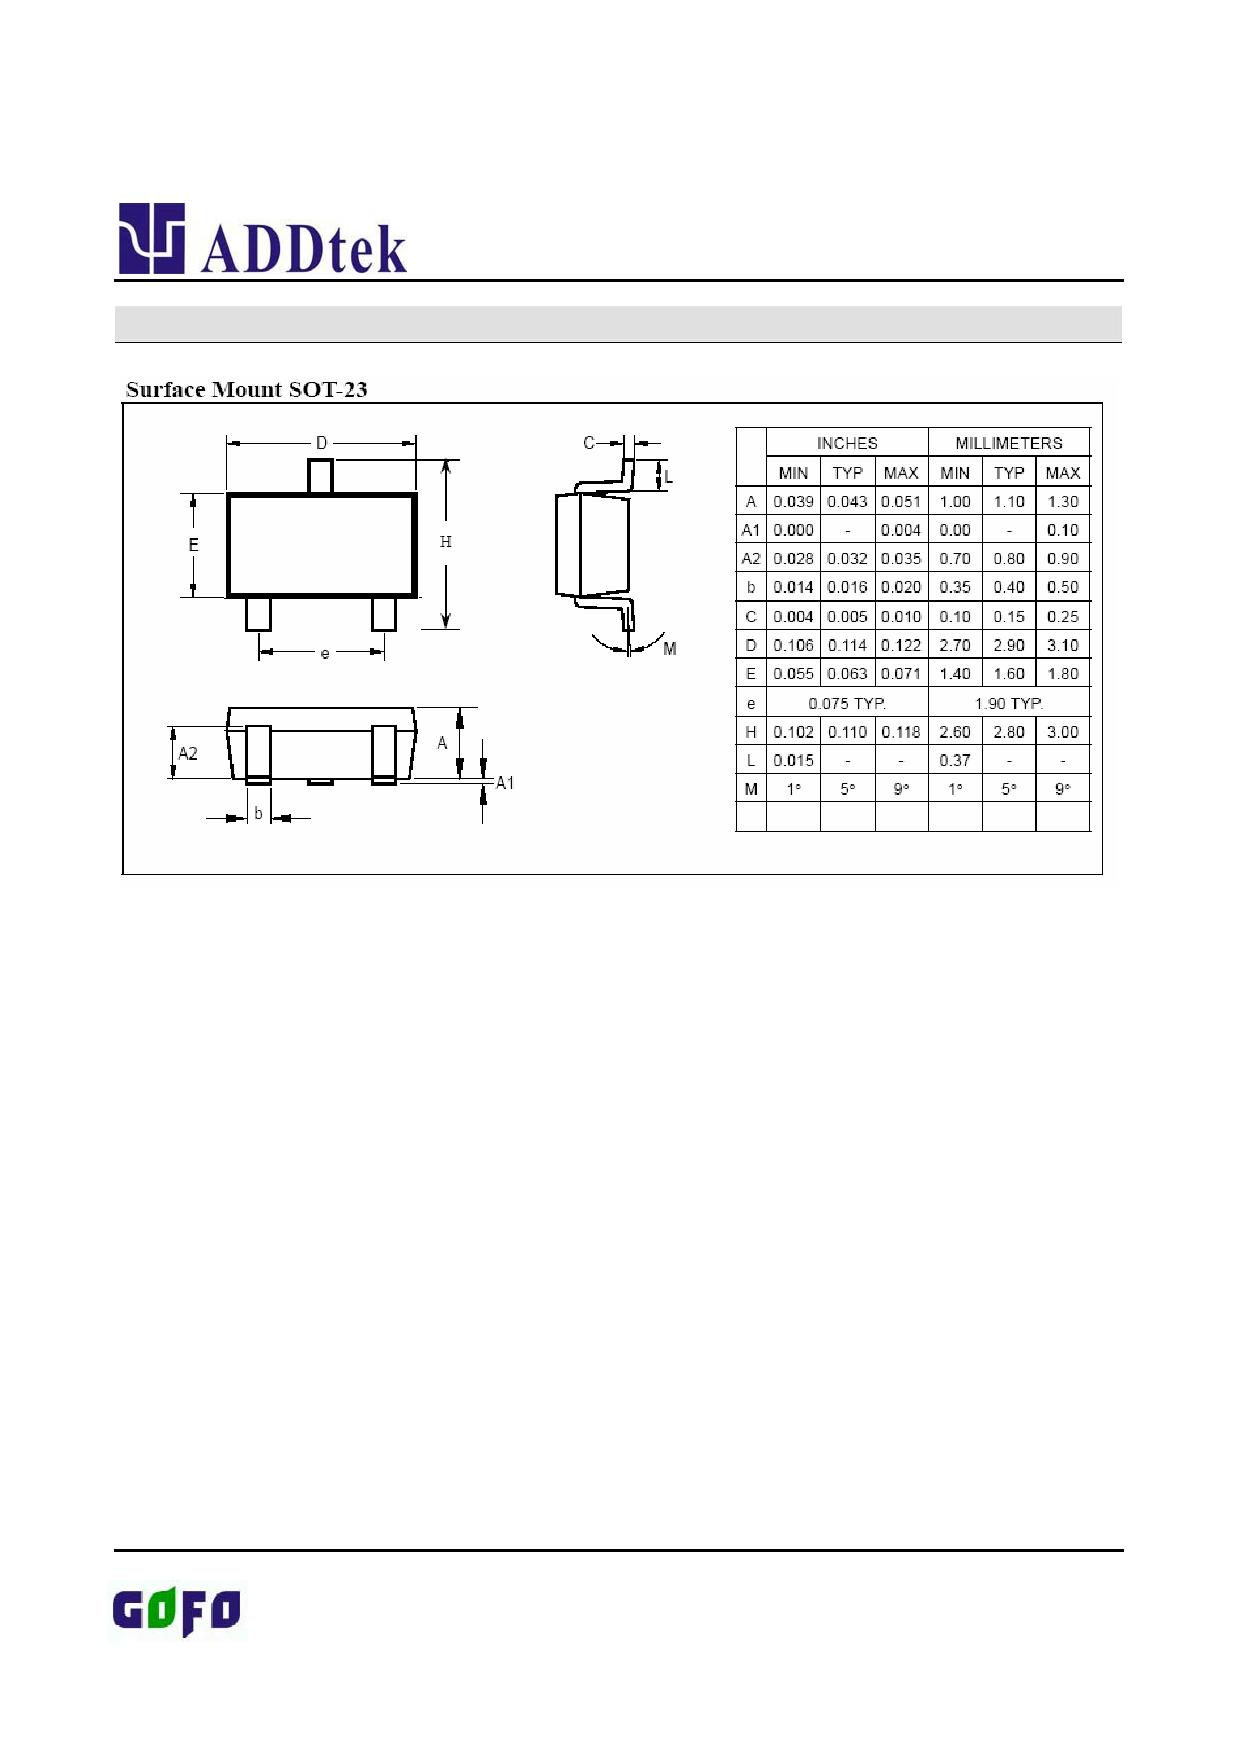 AMC7130 equivalent